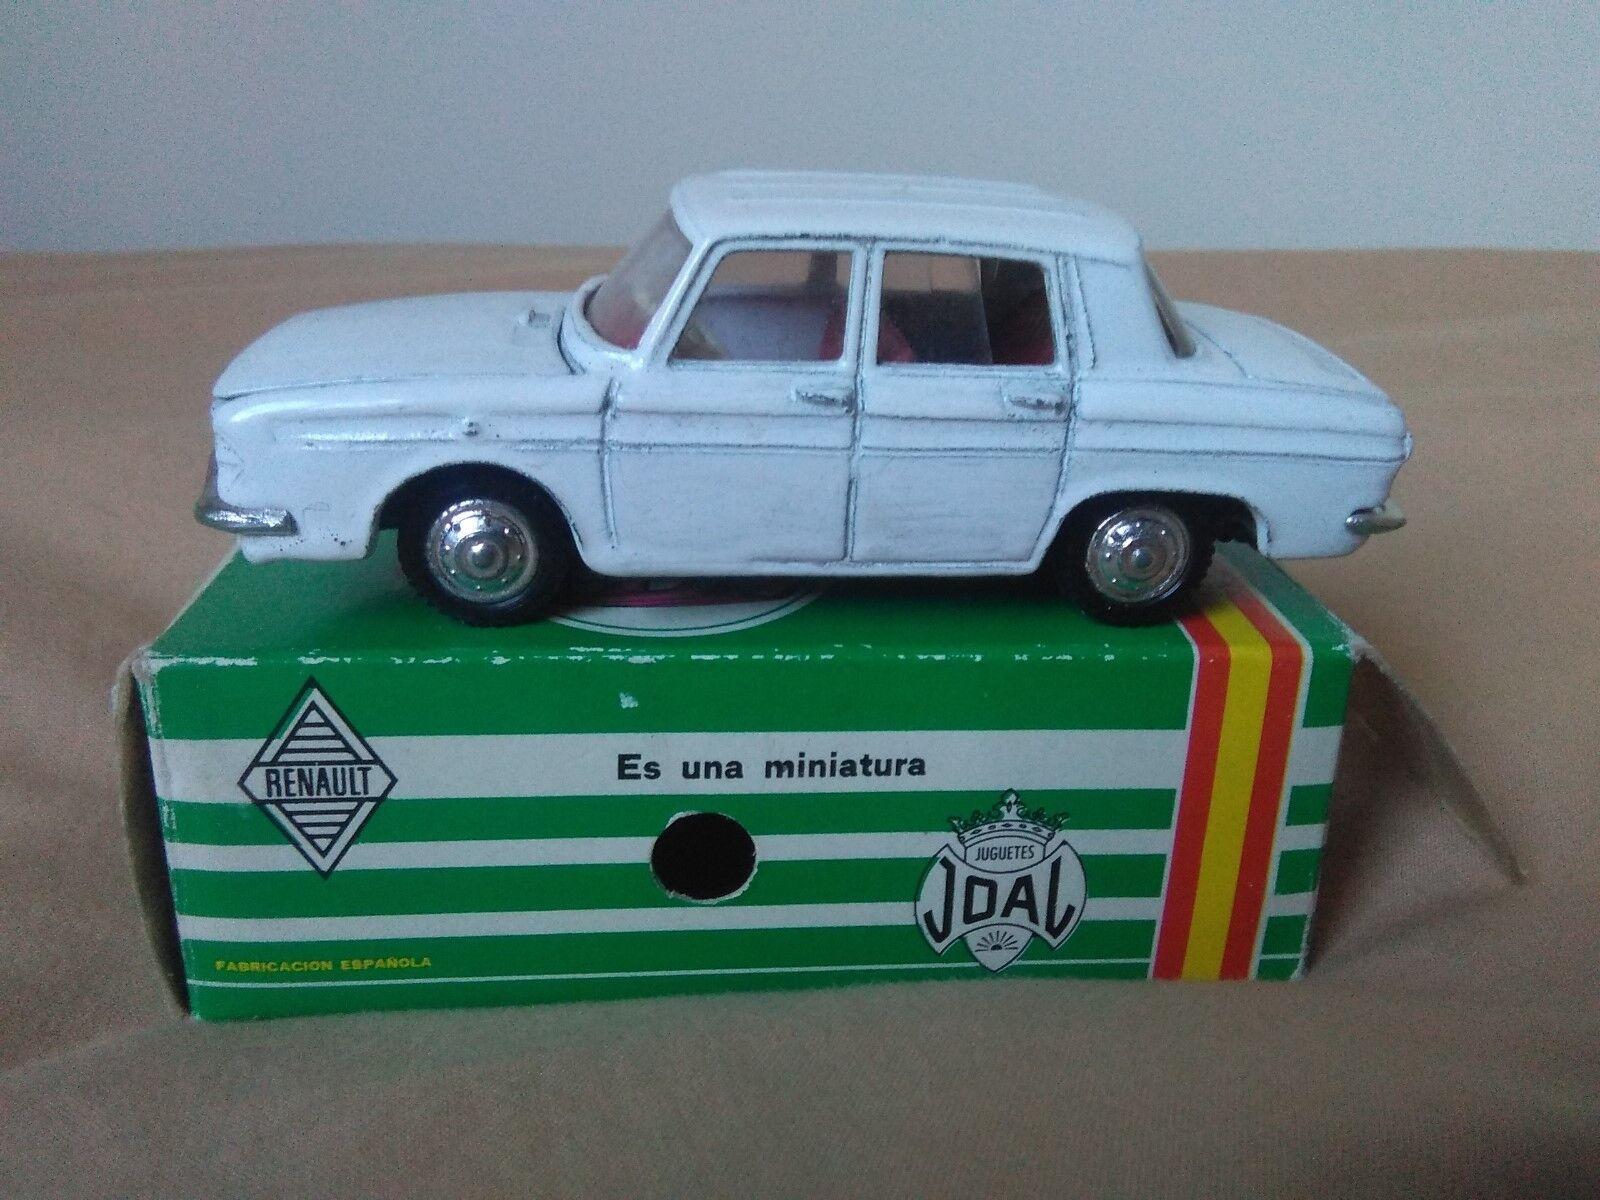 Se vende miniatur 1 43 renault r-10.joal 104 serie 100.in spanien.